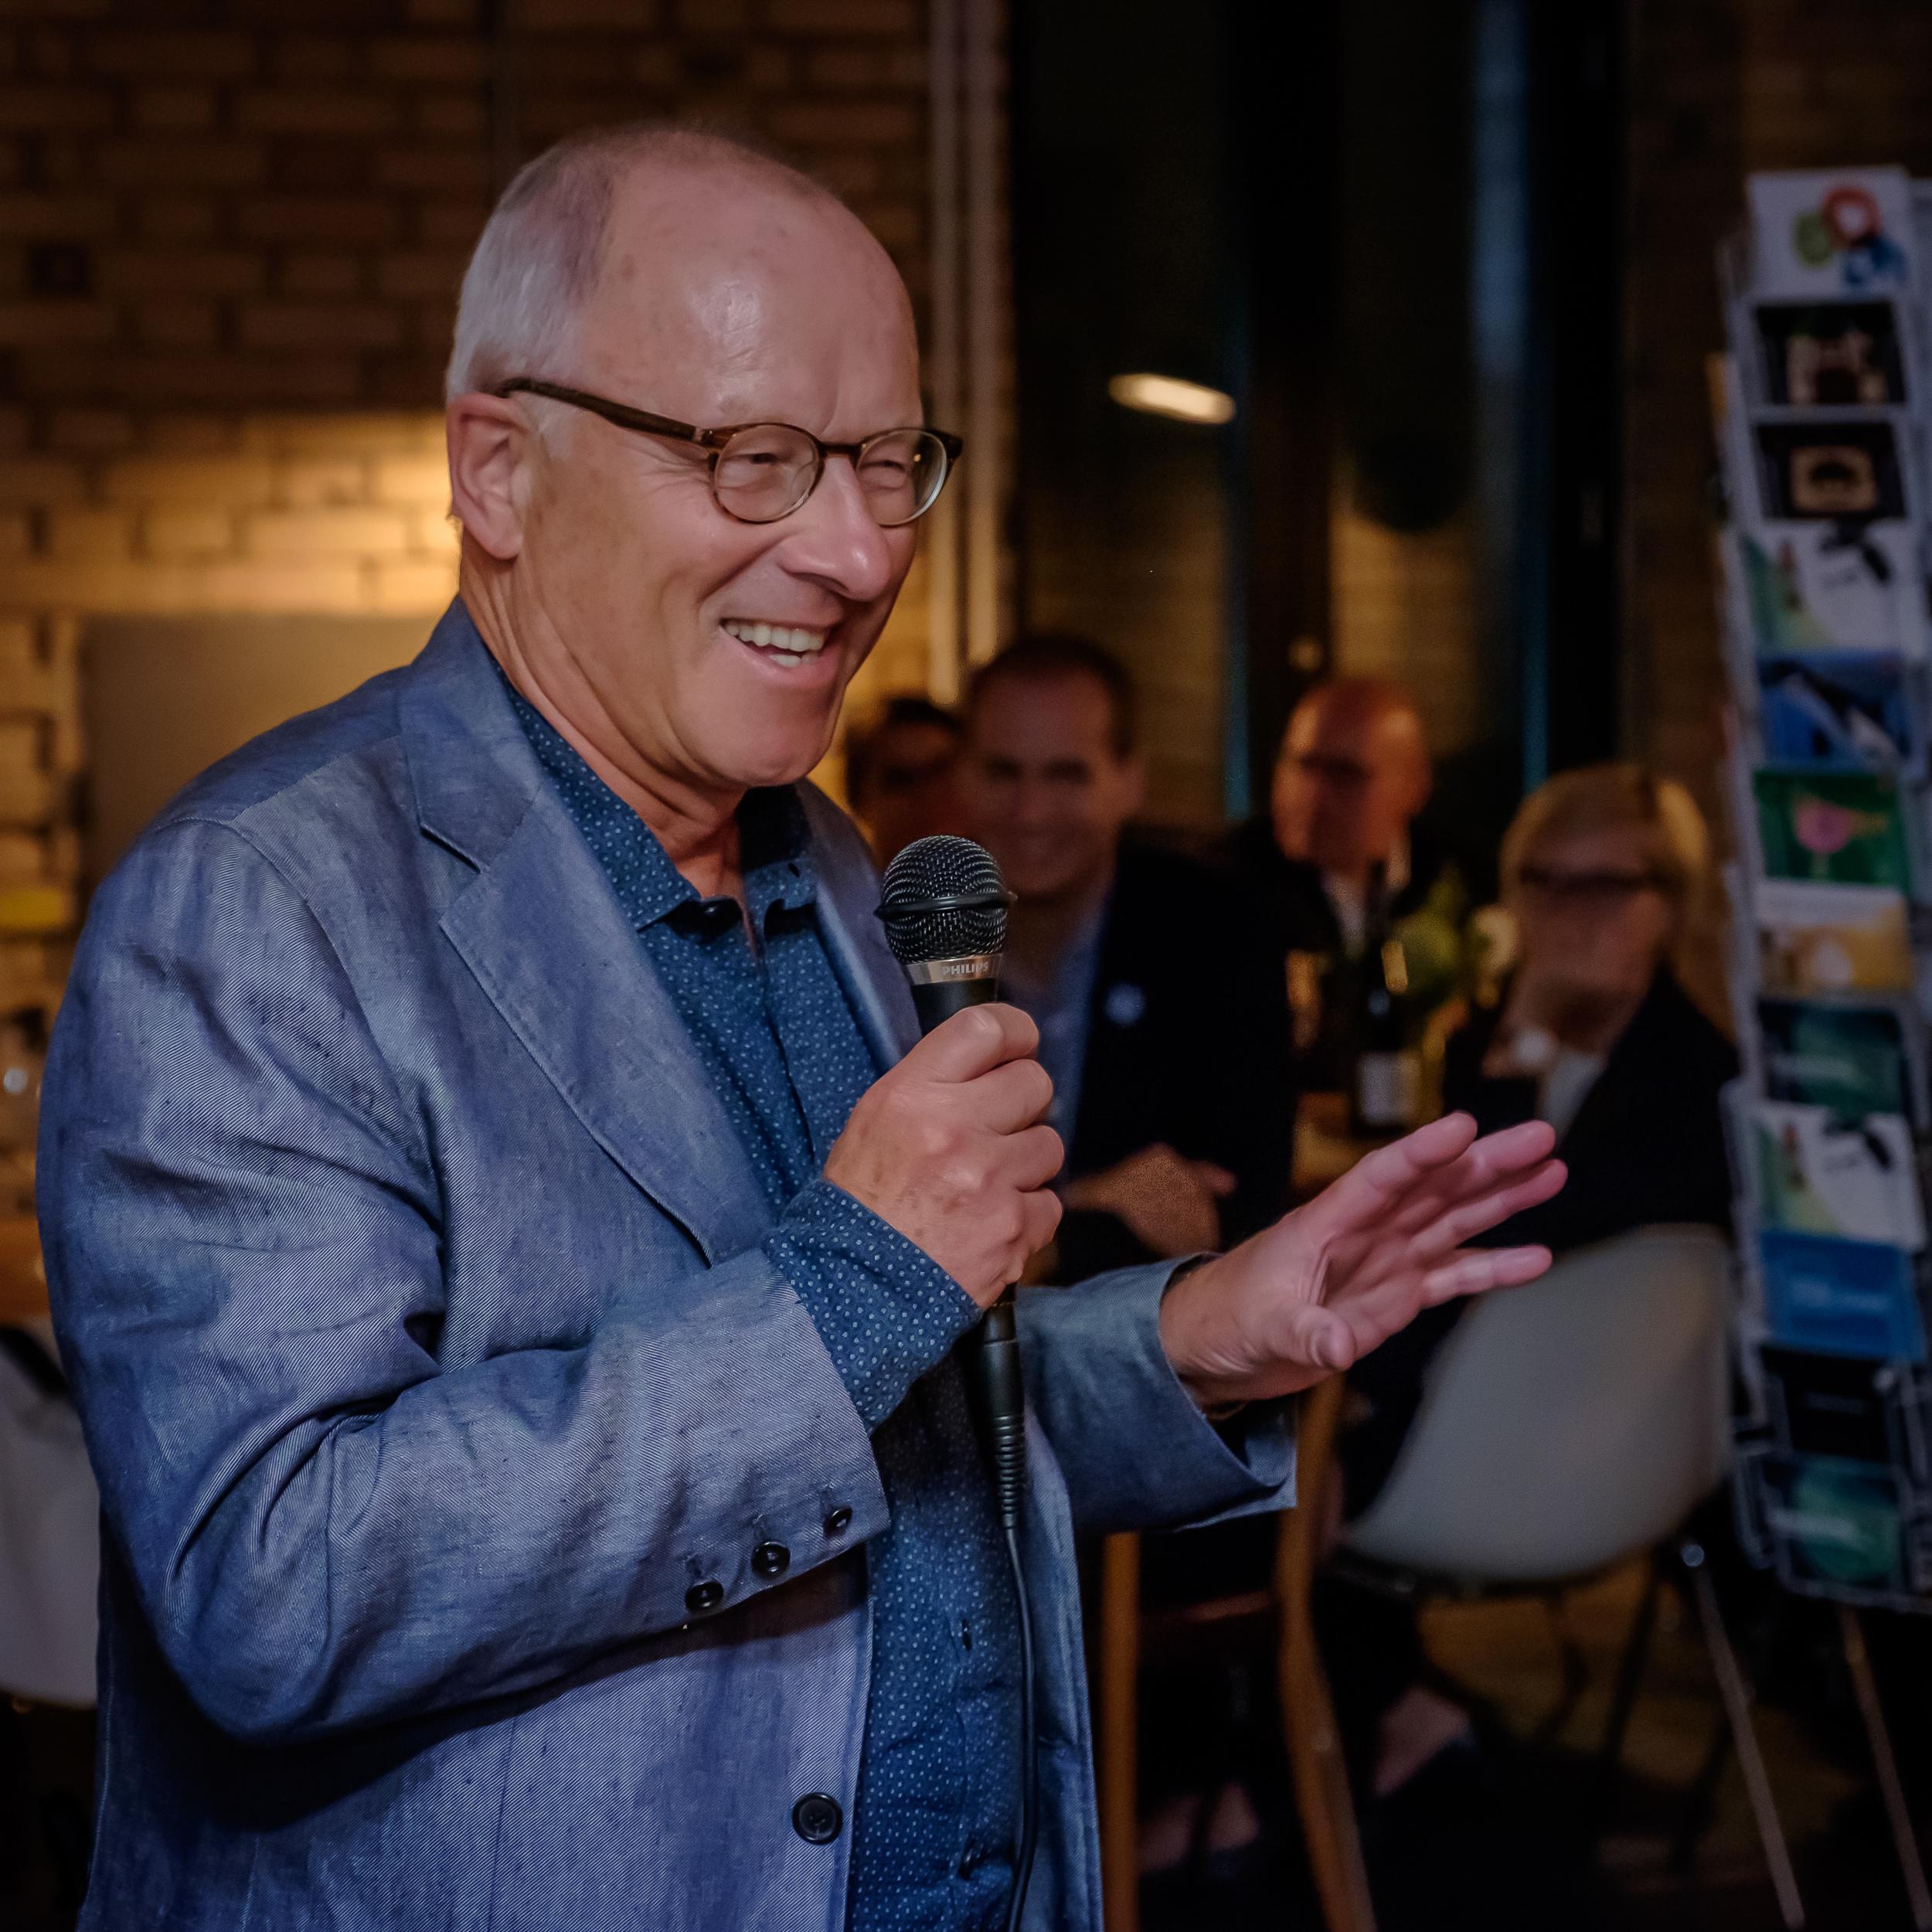 Stefan Schmidheiny am Opening Dinner des Impact Hub Colab, Zürich